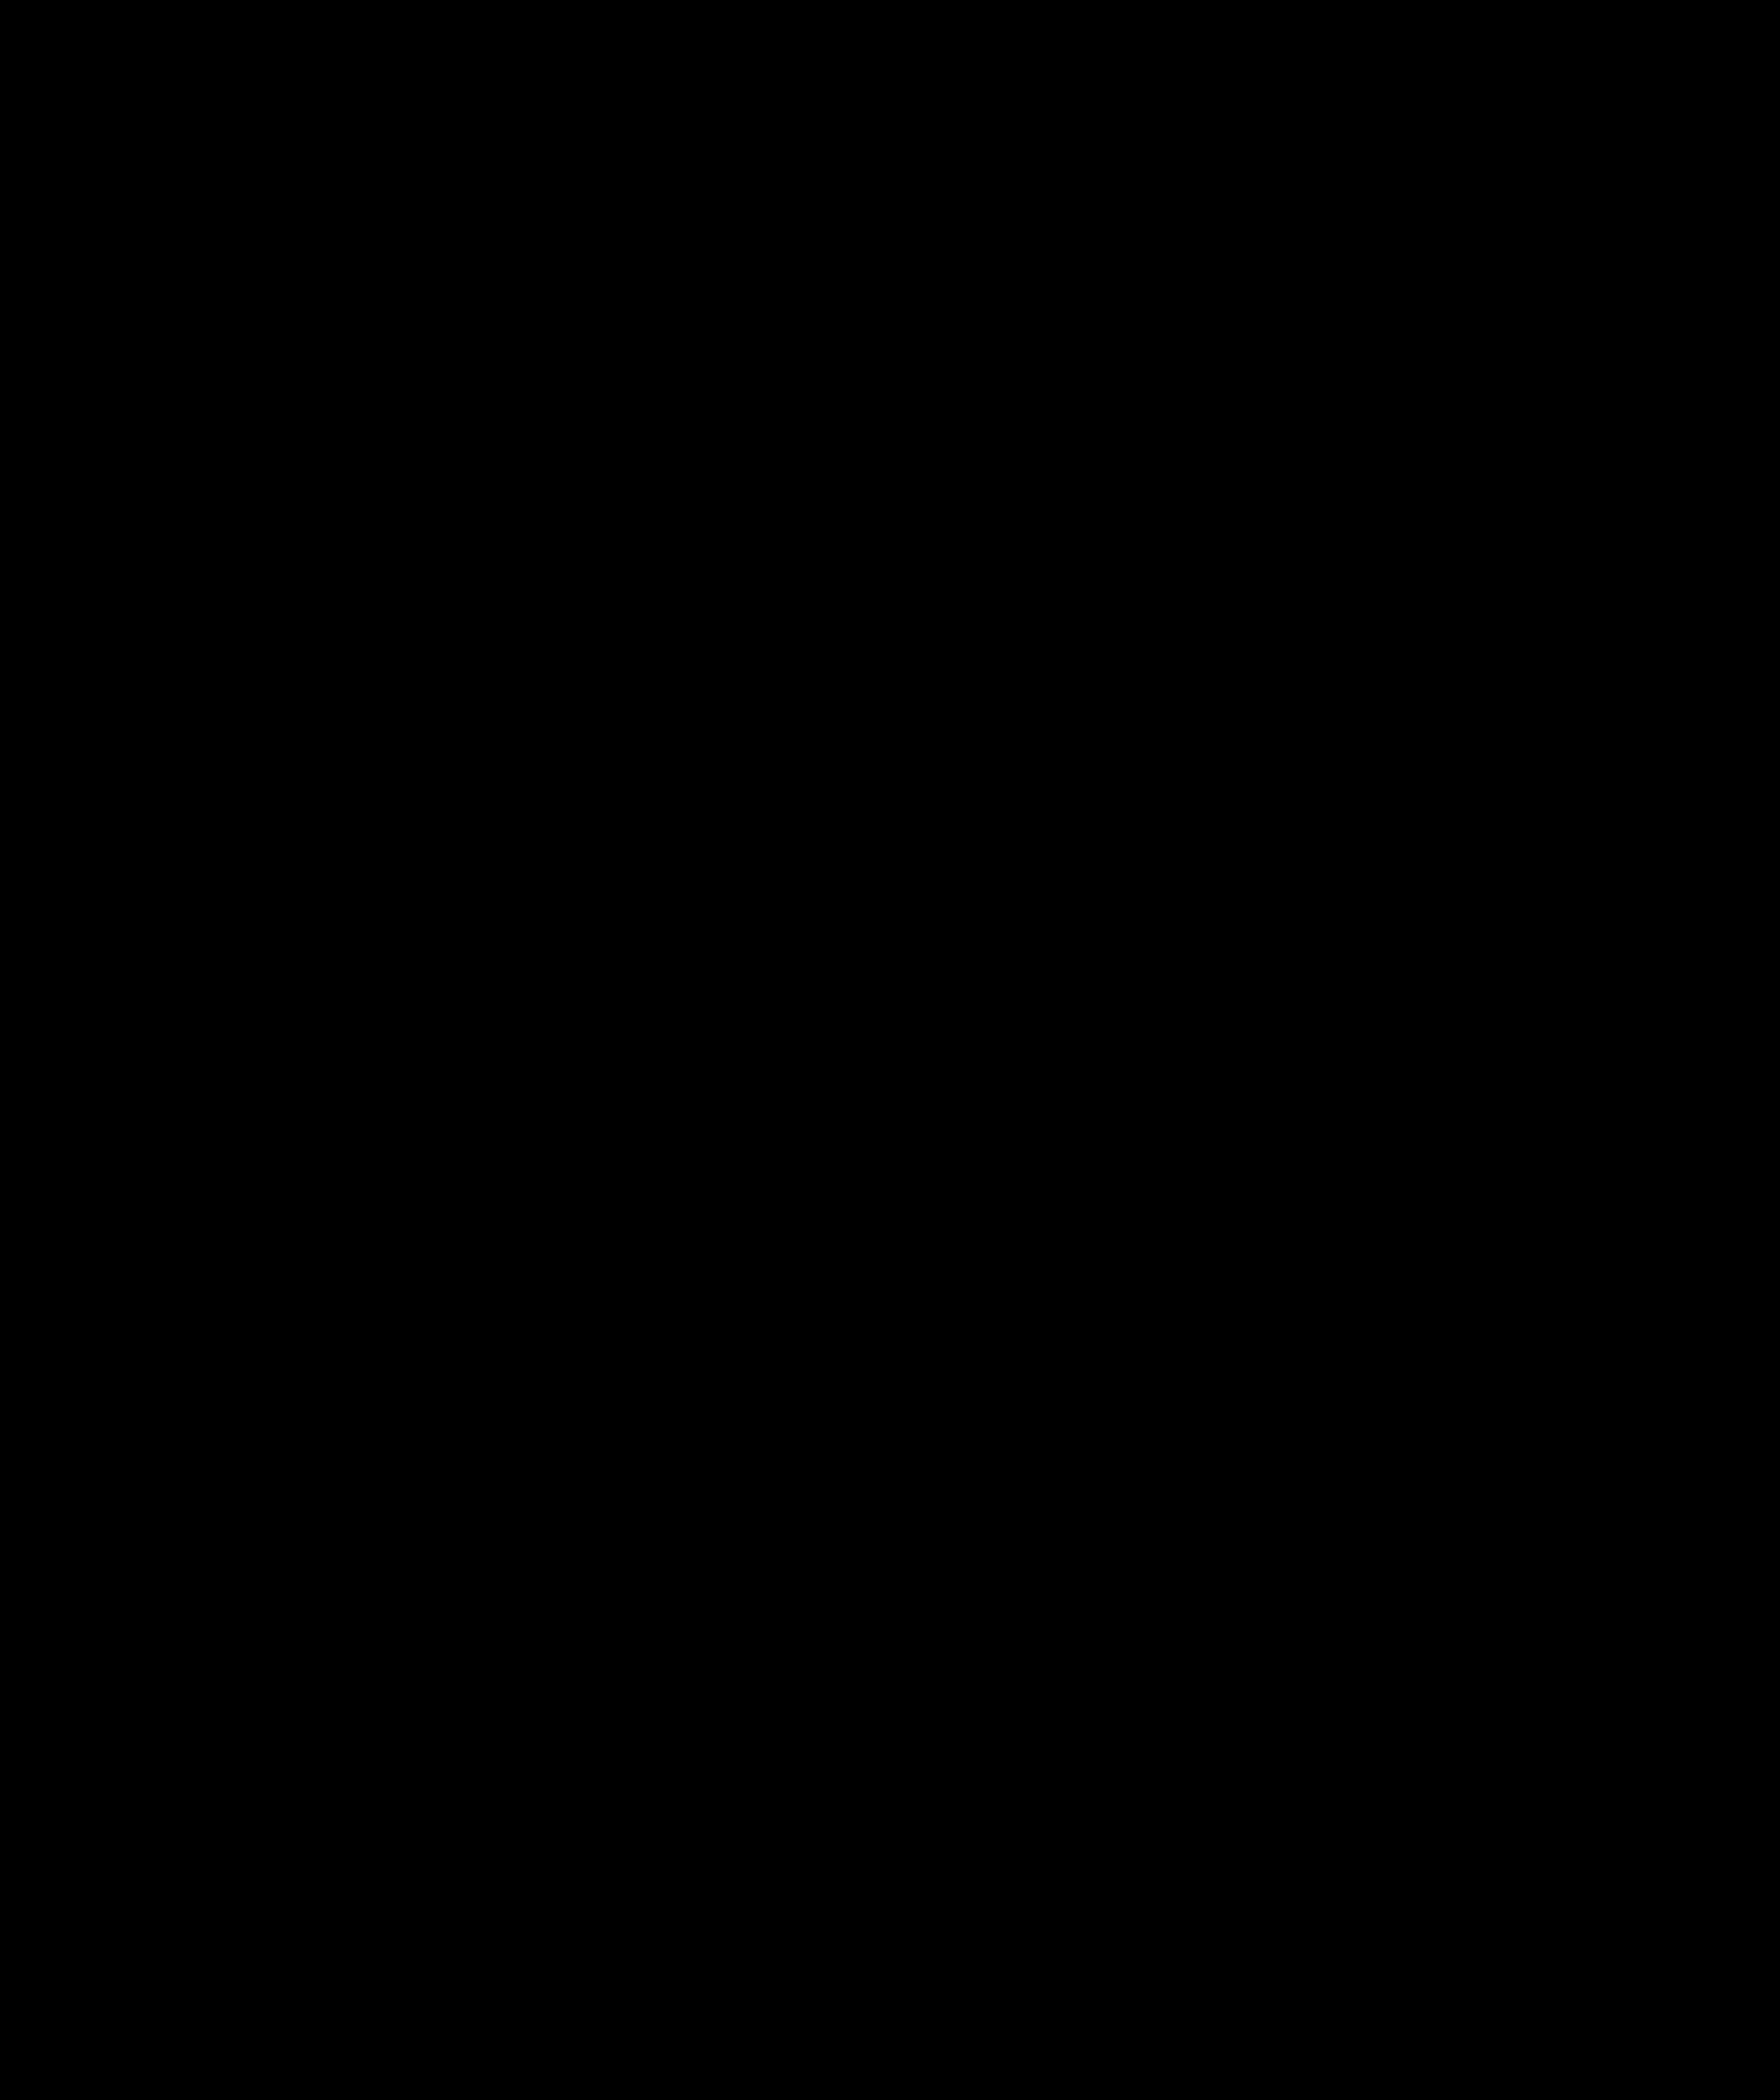 2016x2400 Clipart